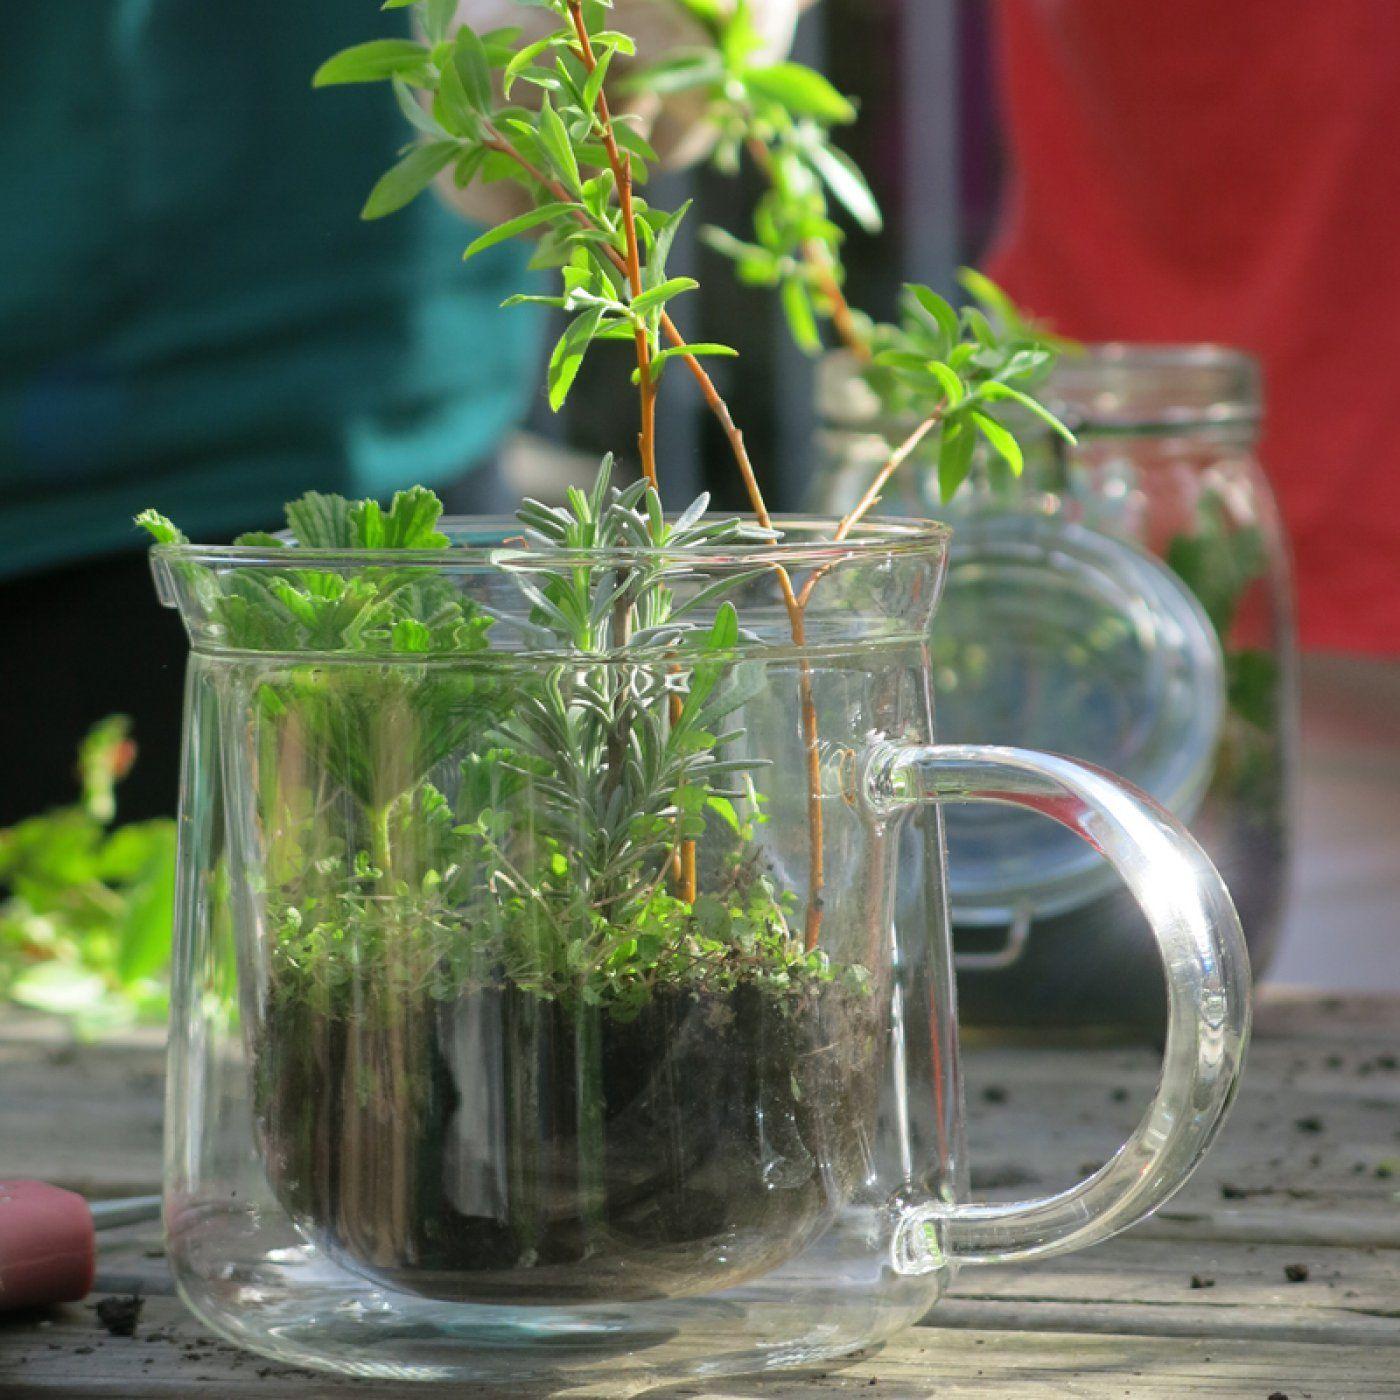 Jardinage: faites pousser vos propres boutures!